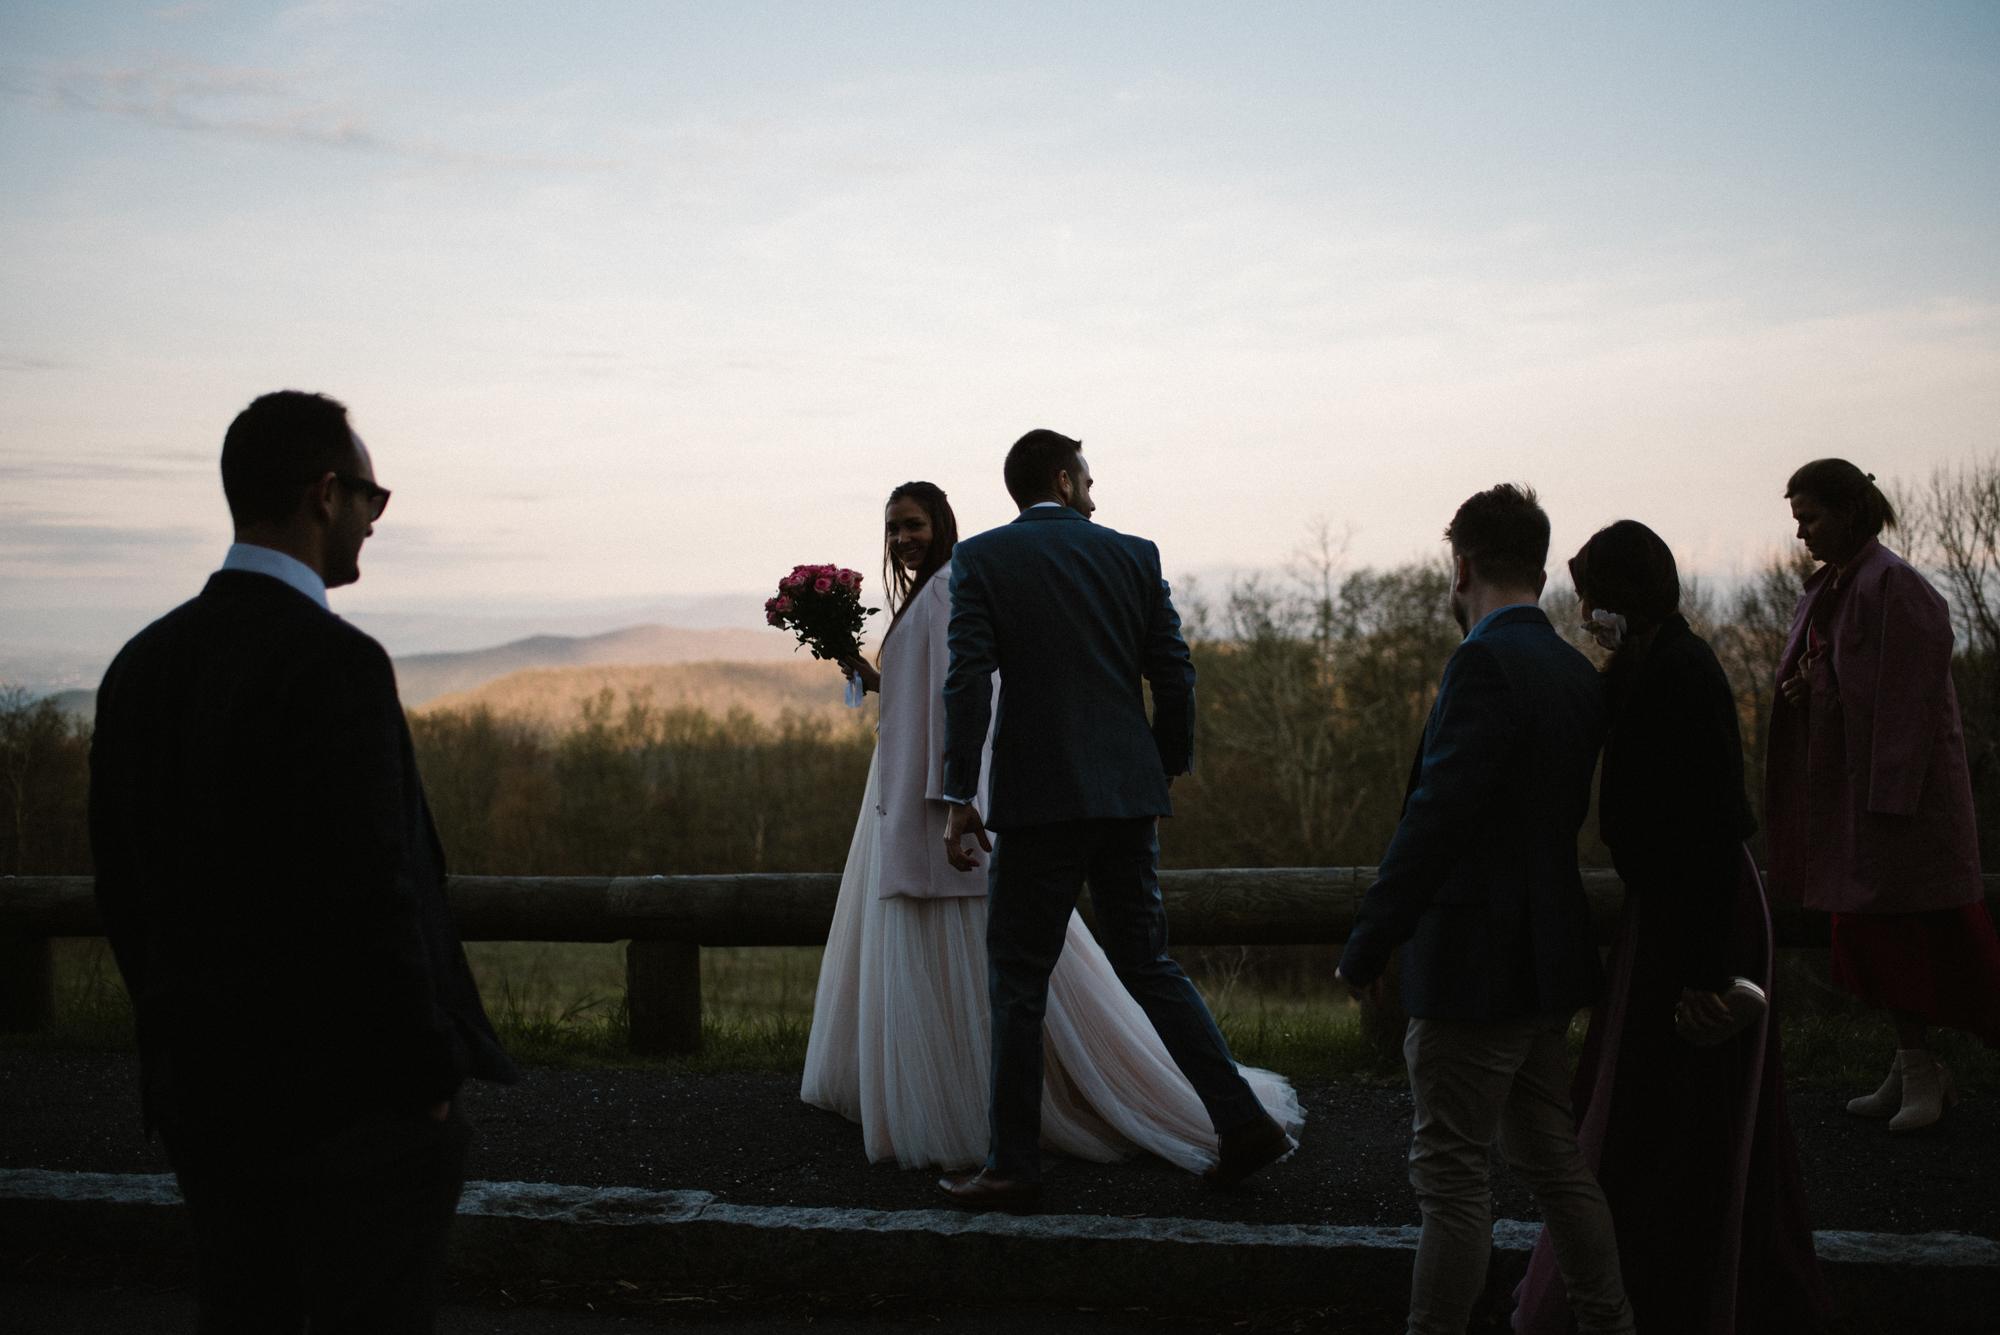 Paula and Andrew - Small Adventurous Wedding in Shenandoah National Park - Blue Ridge Mountain Wedding - White Sails Creative - Mountain Elopement_12.jpg